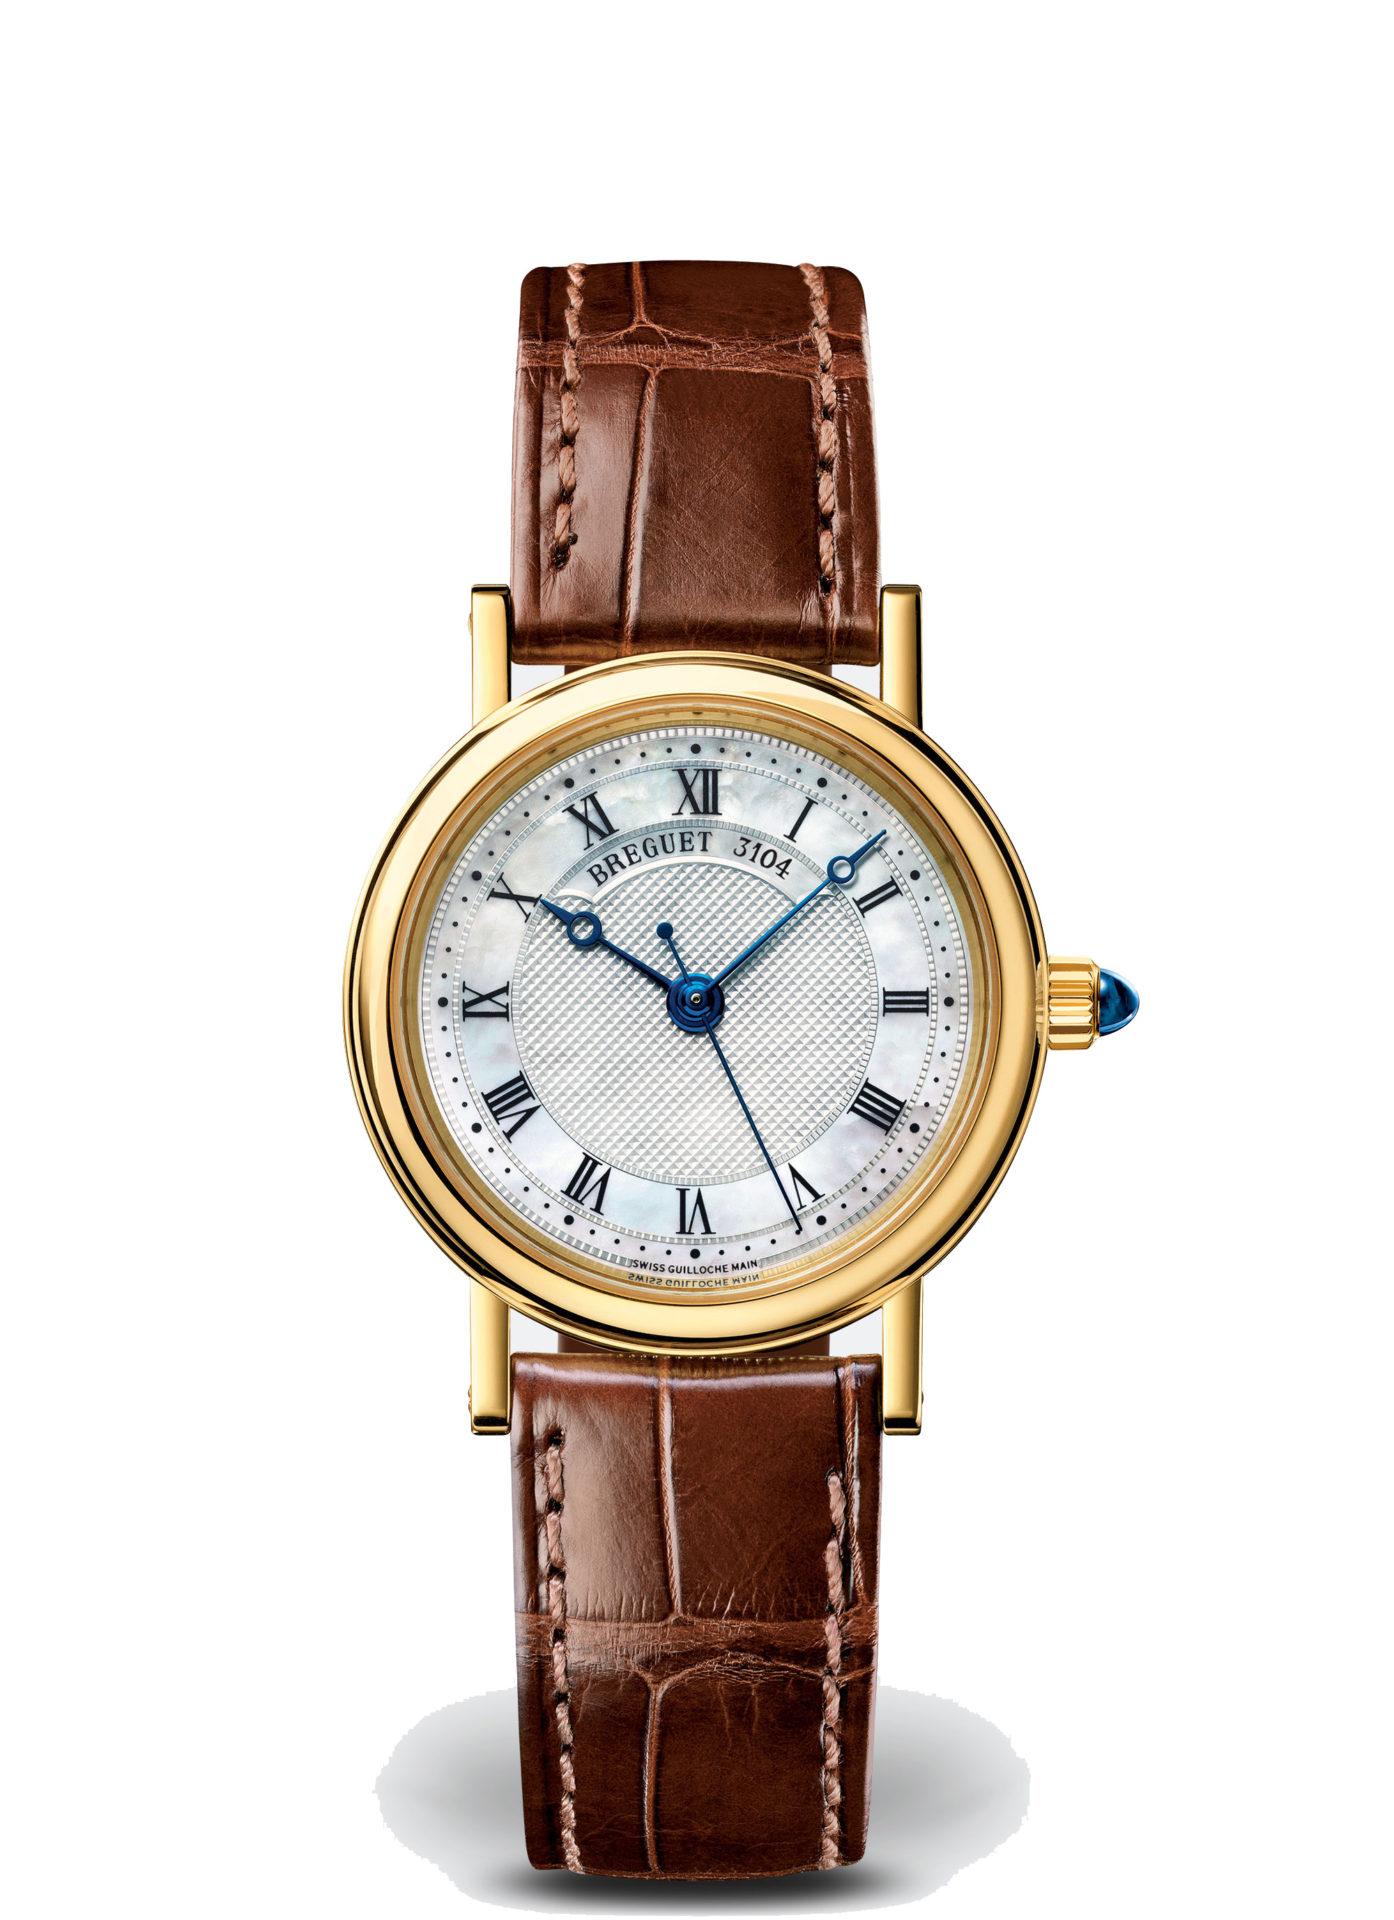 Breguet-Classique-8097-Hall-of-Time-8067ba-52-964-g-0